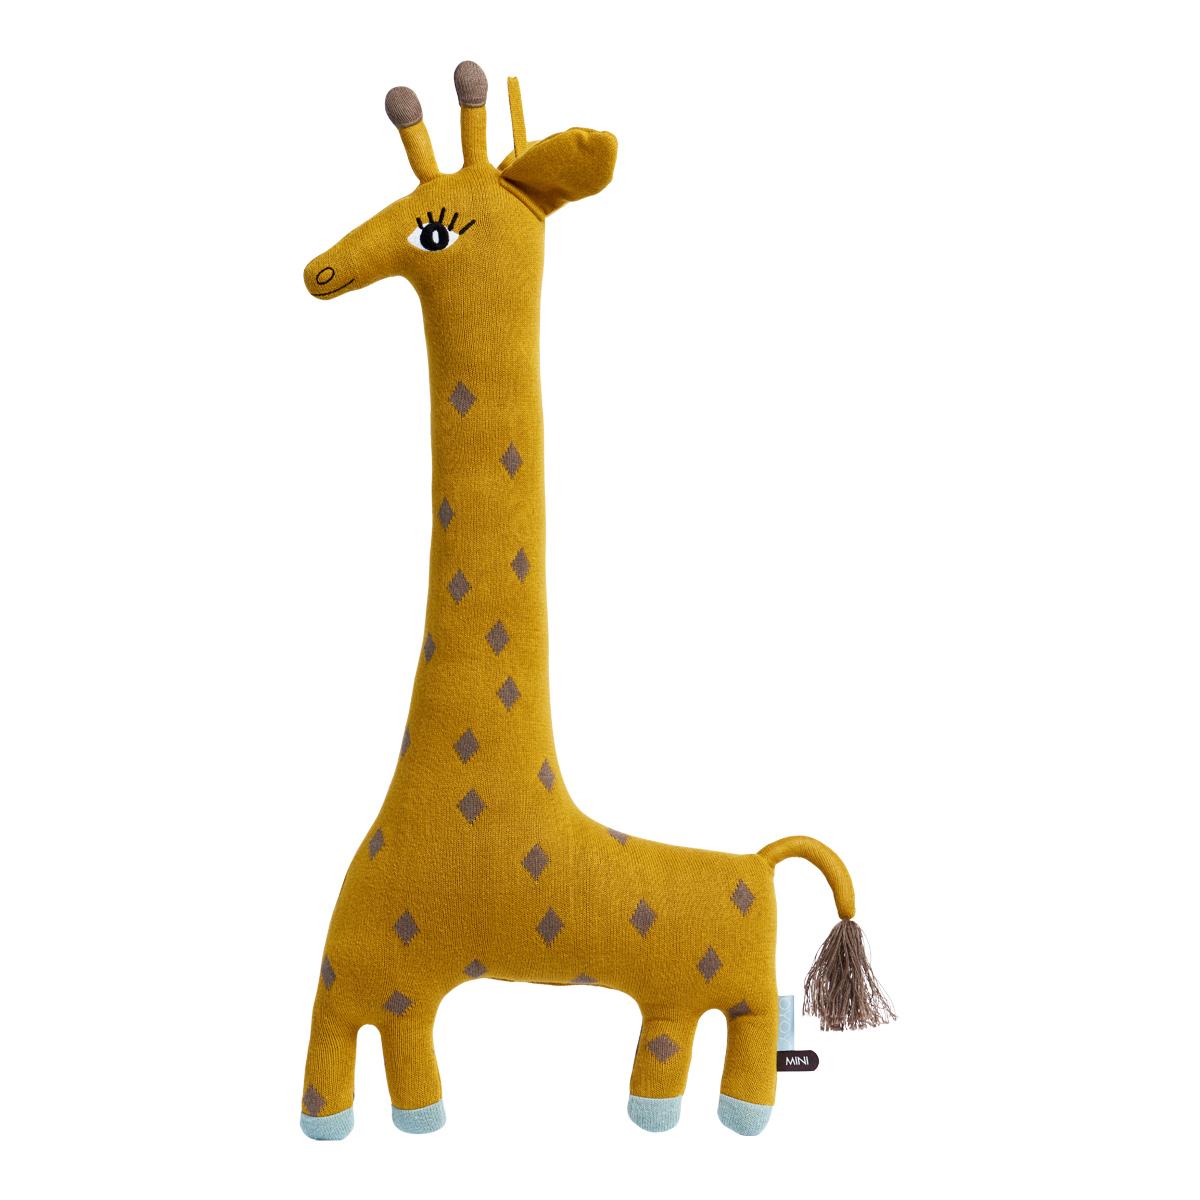 Coussin Coussin Noah la Girafe Coussin Noah la Girafe